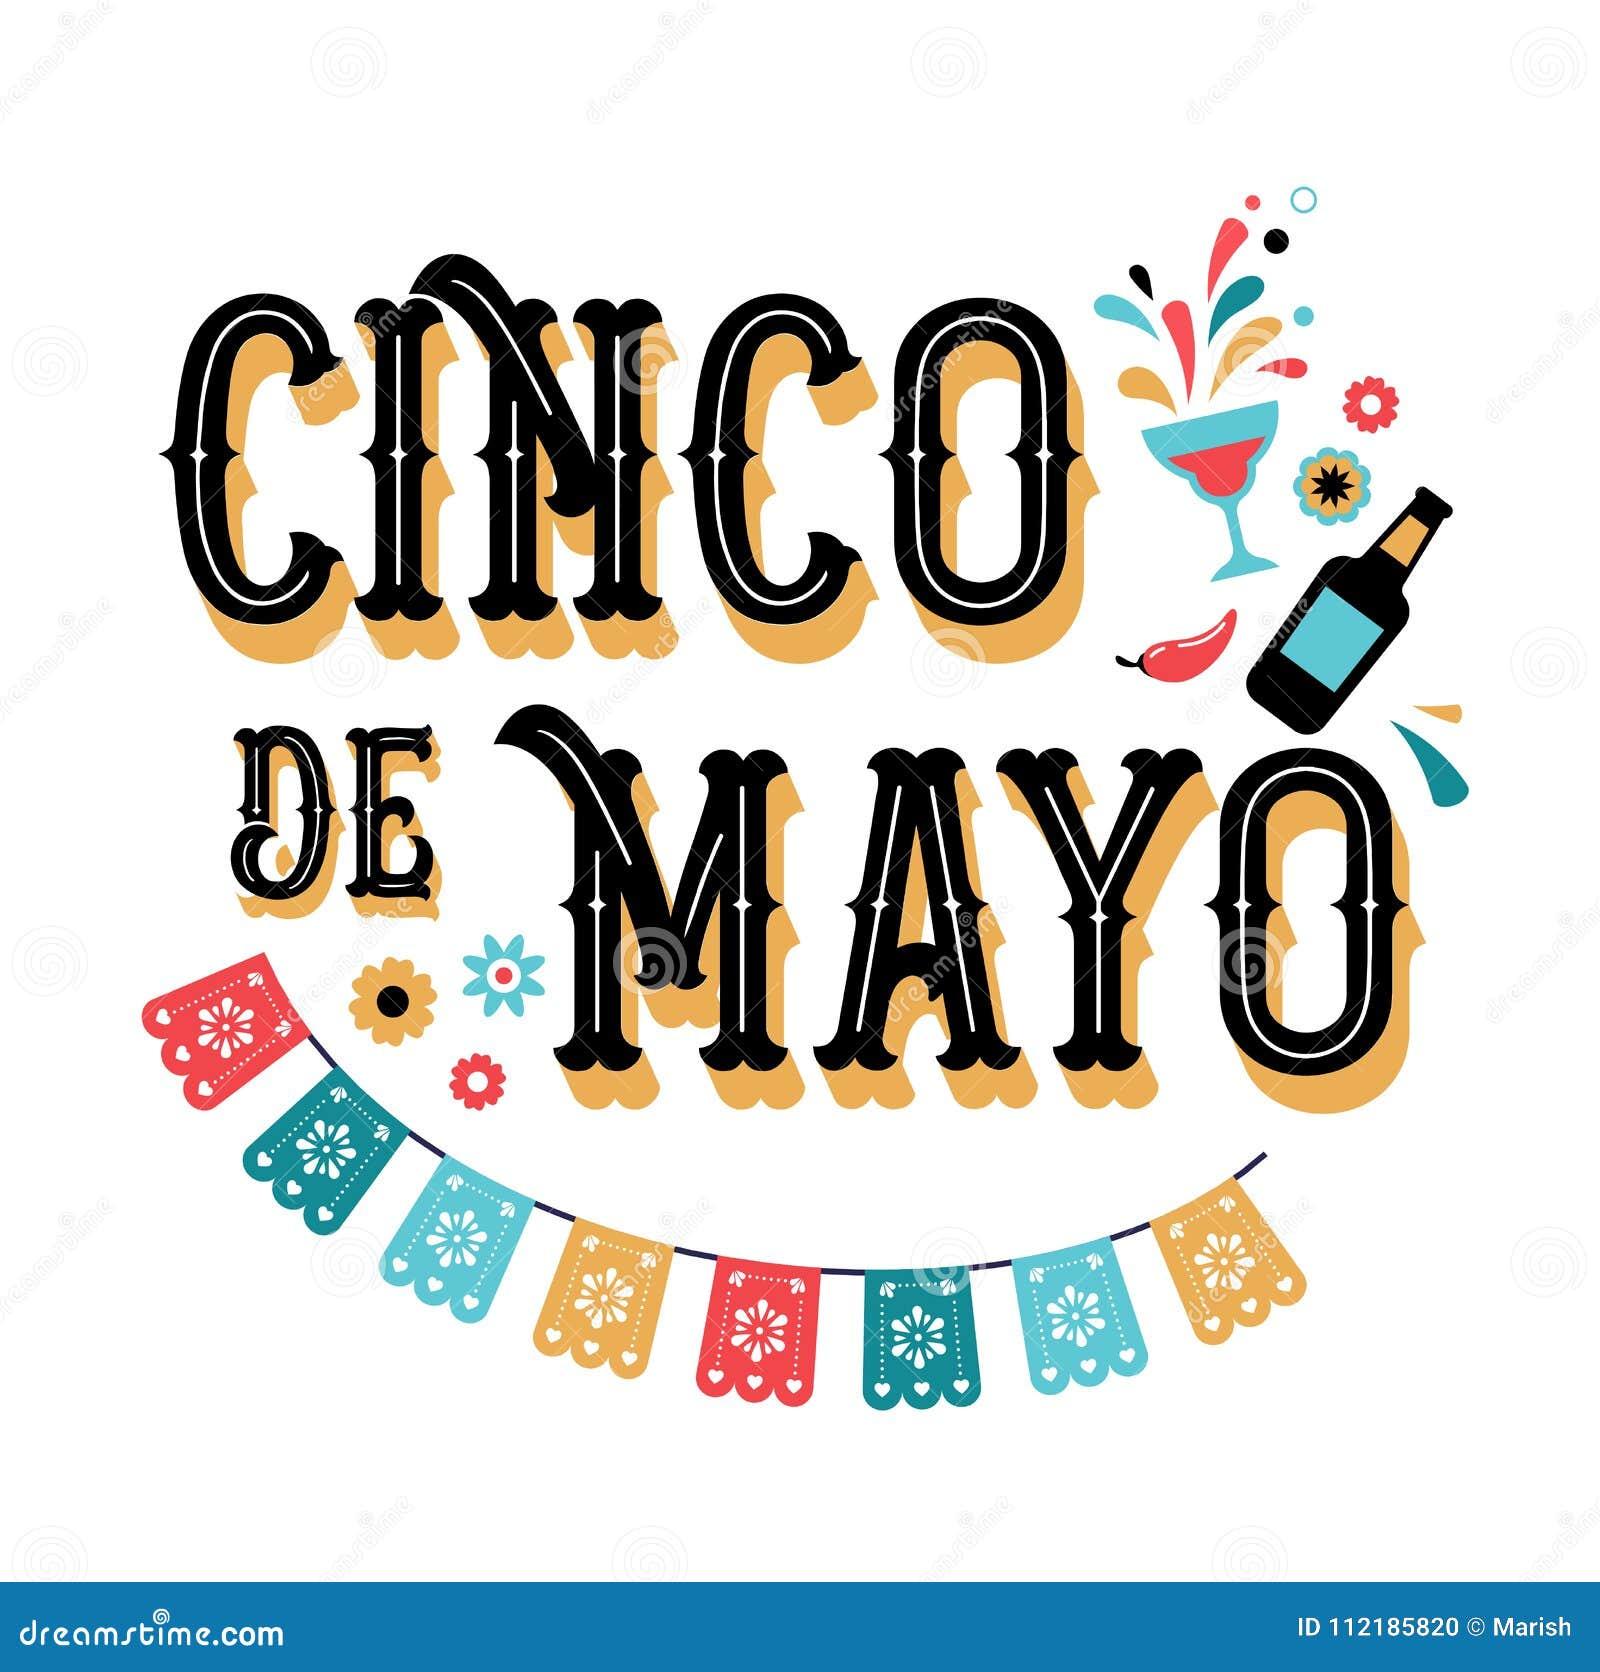 Cinco de Mayo - Maj 5, federal ferie i Mexico Fiestabaner- och affischdesign med flaggor